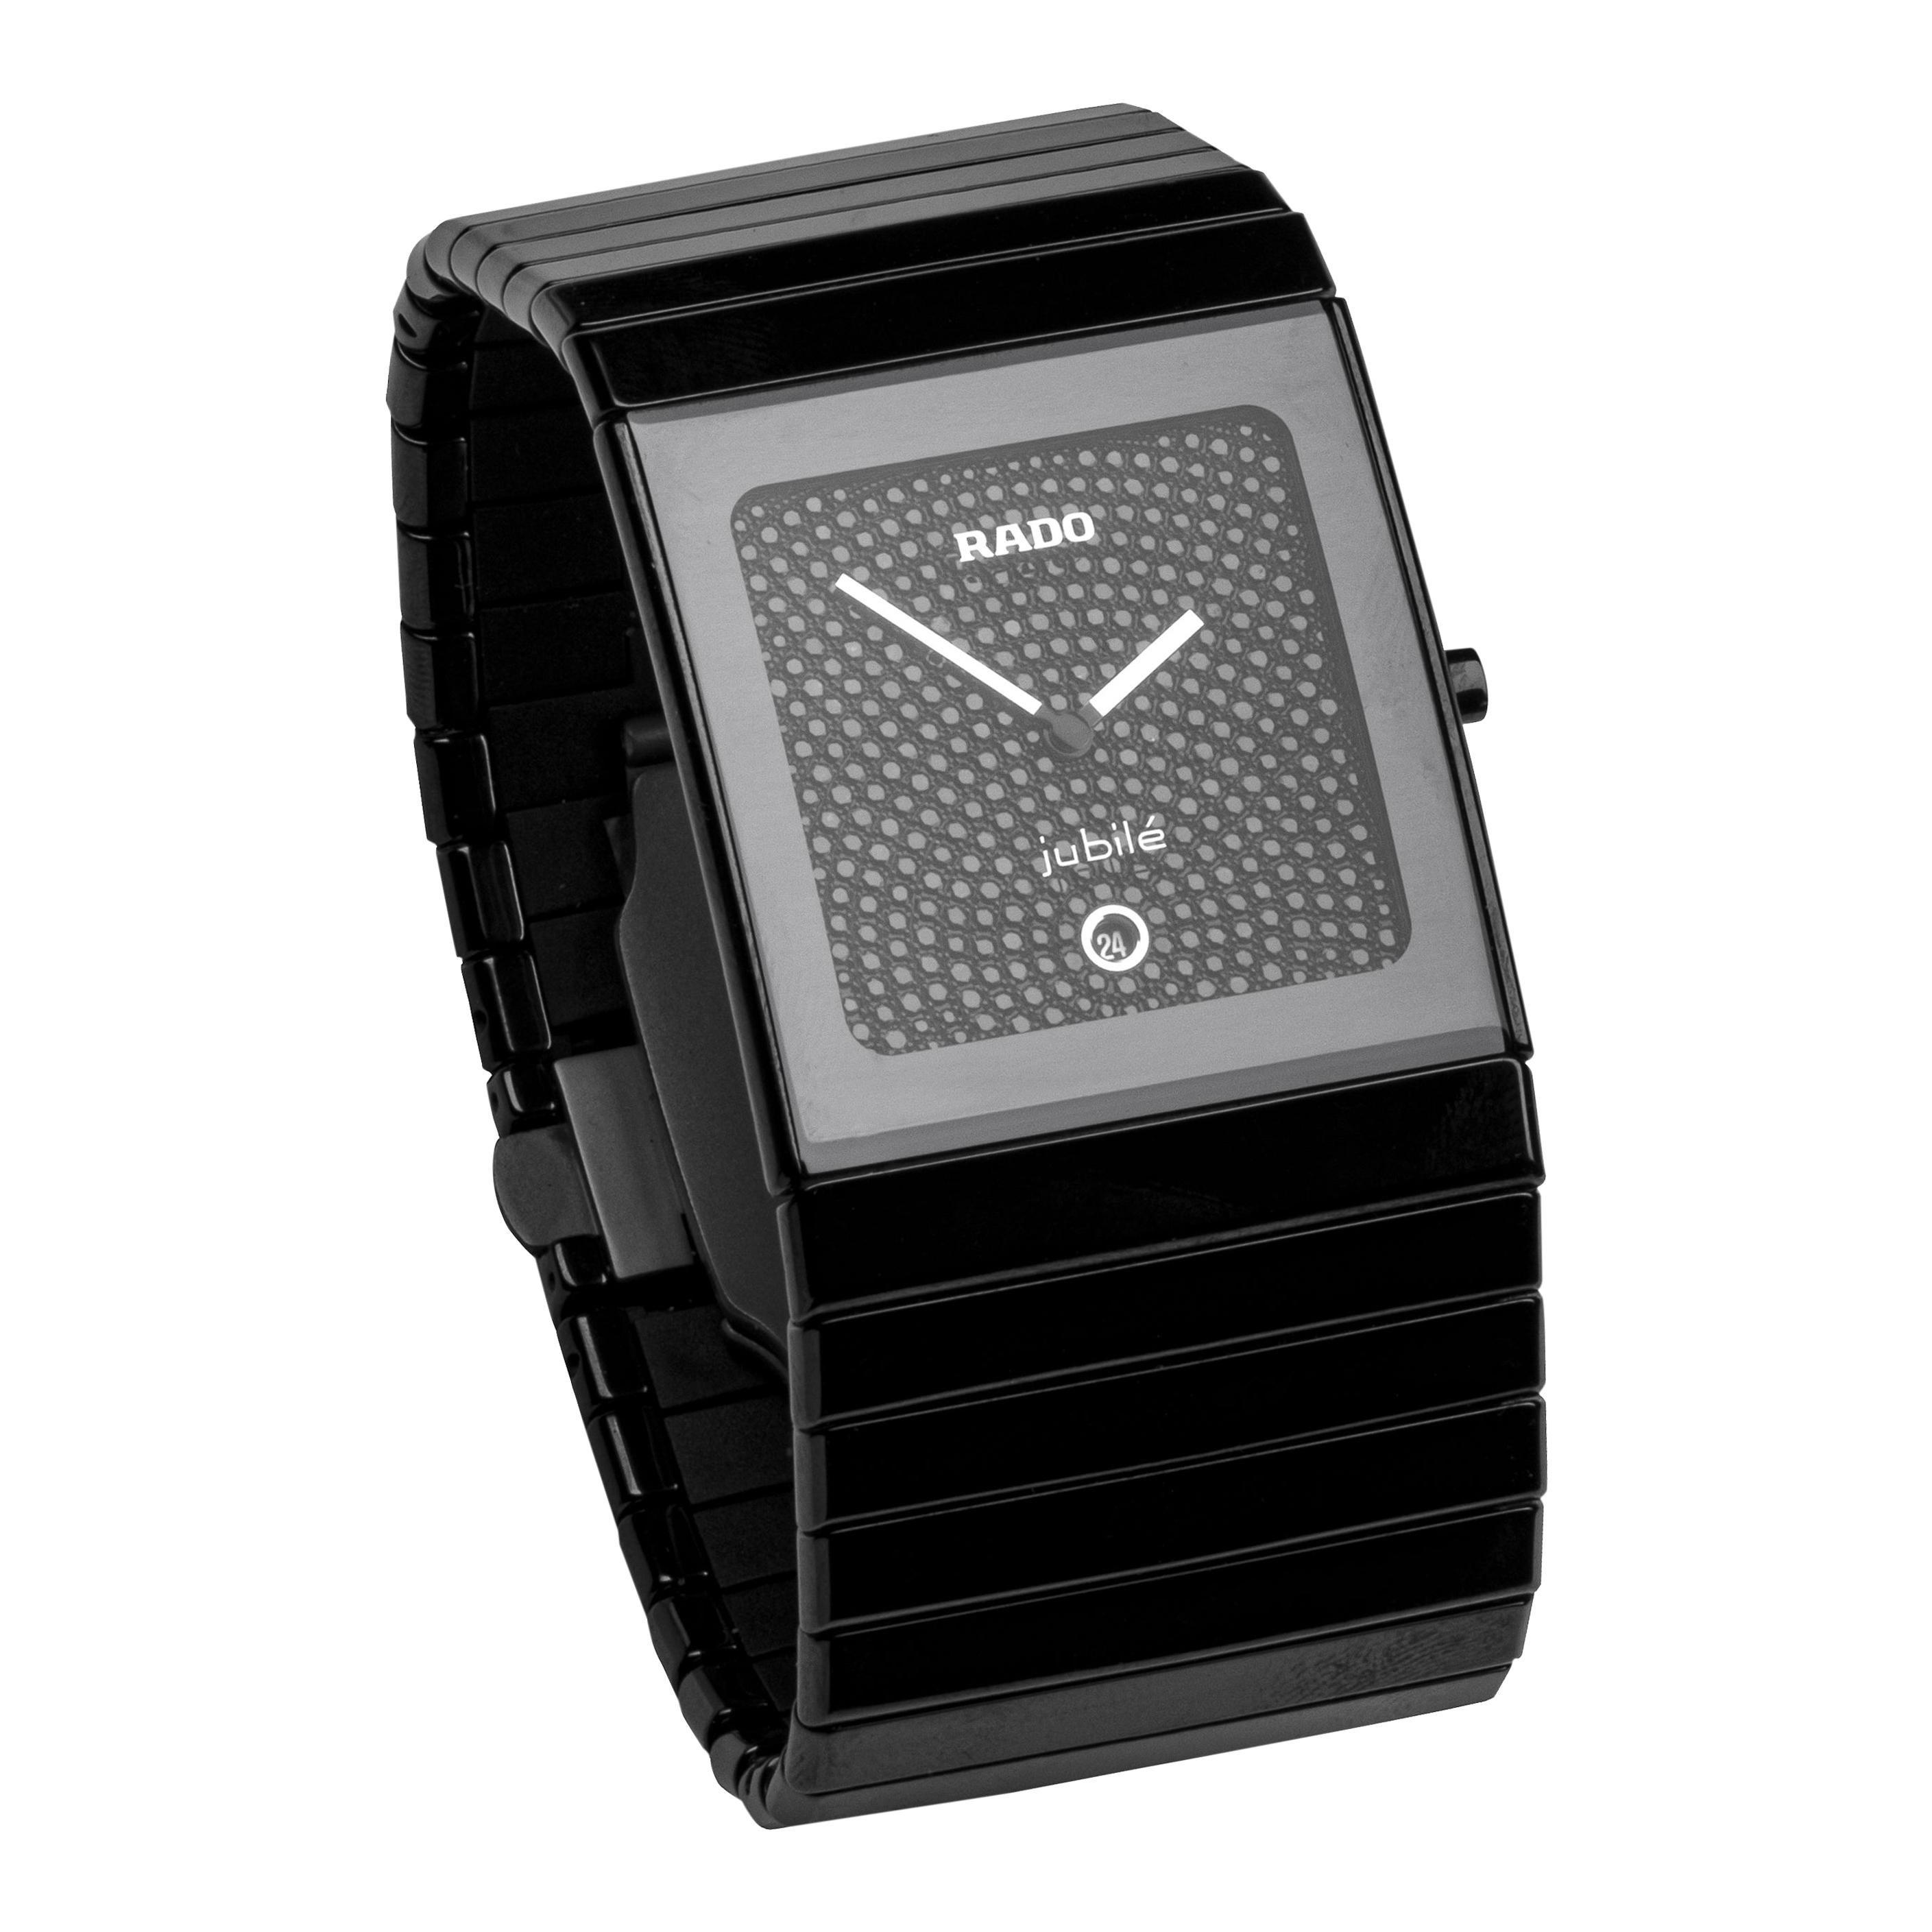 Rado Jubile Ceramica Black Diamond Face Watch